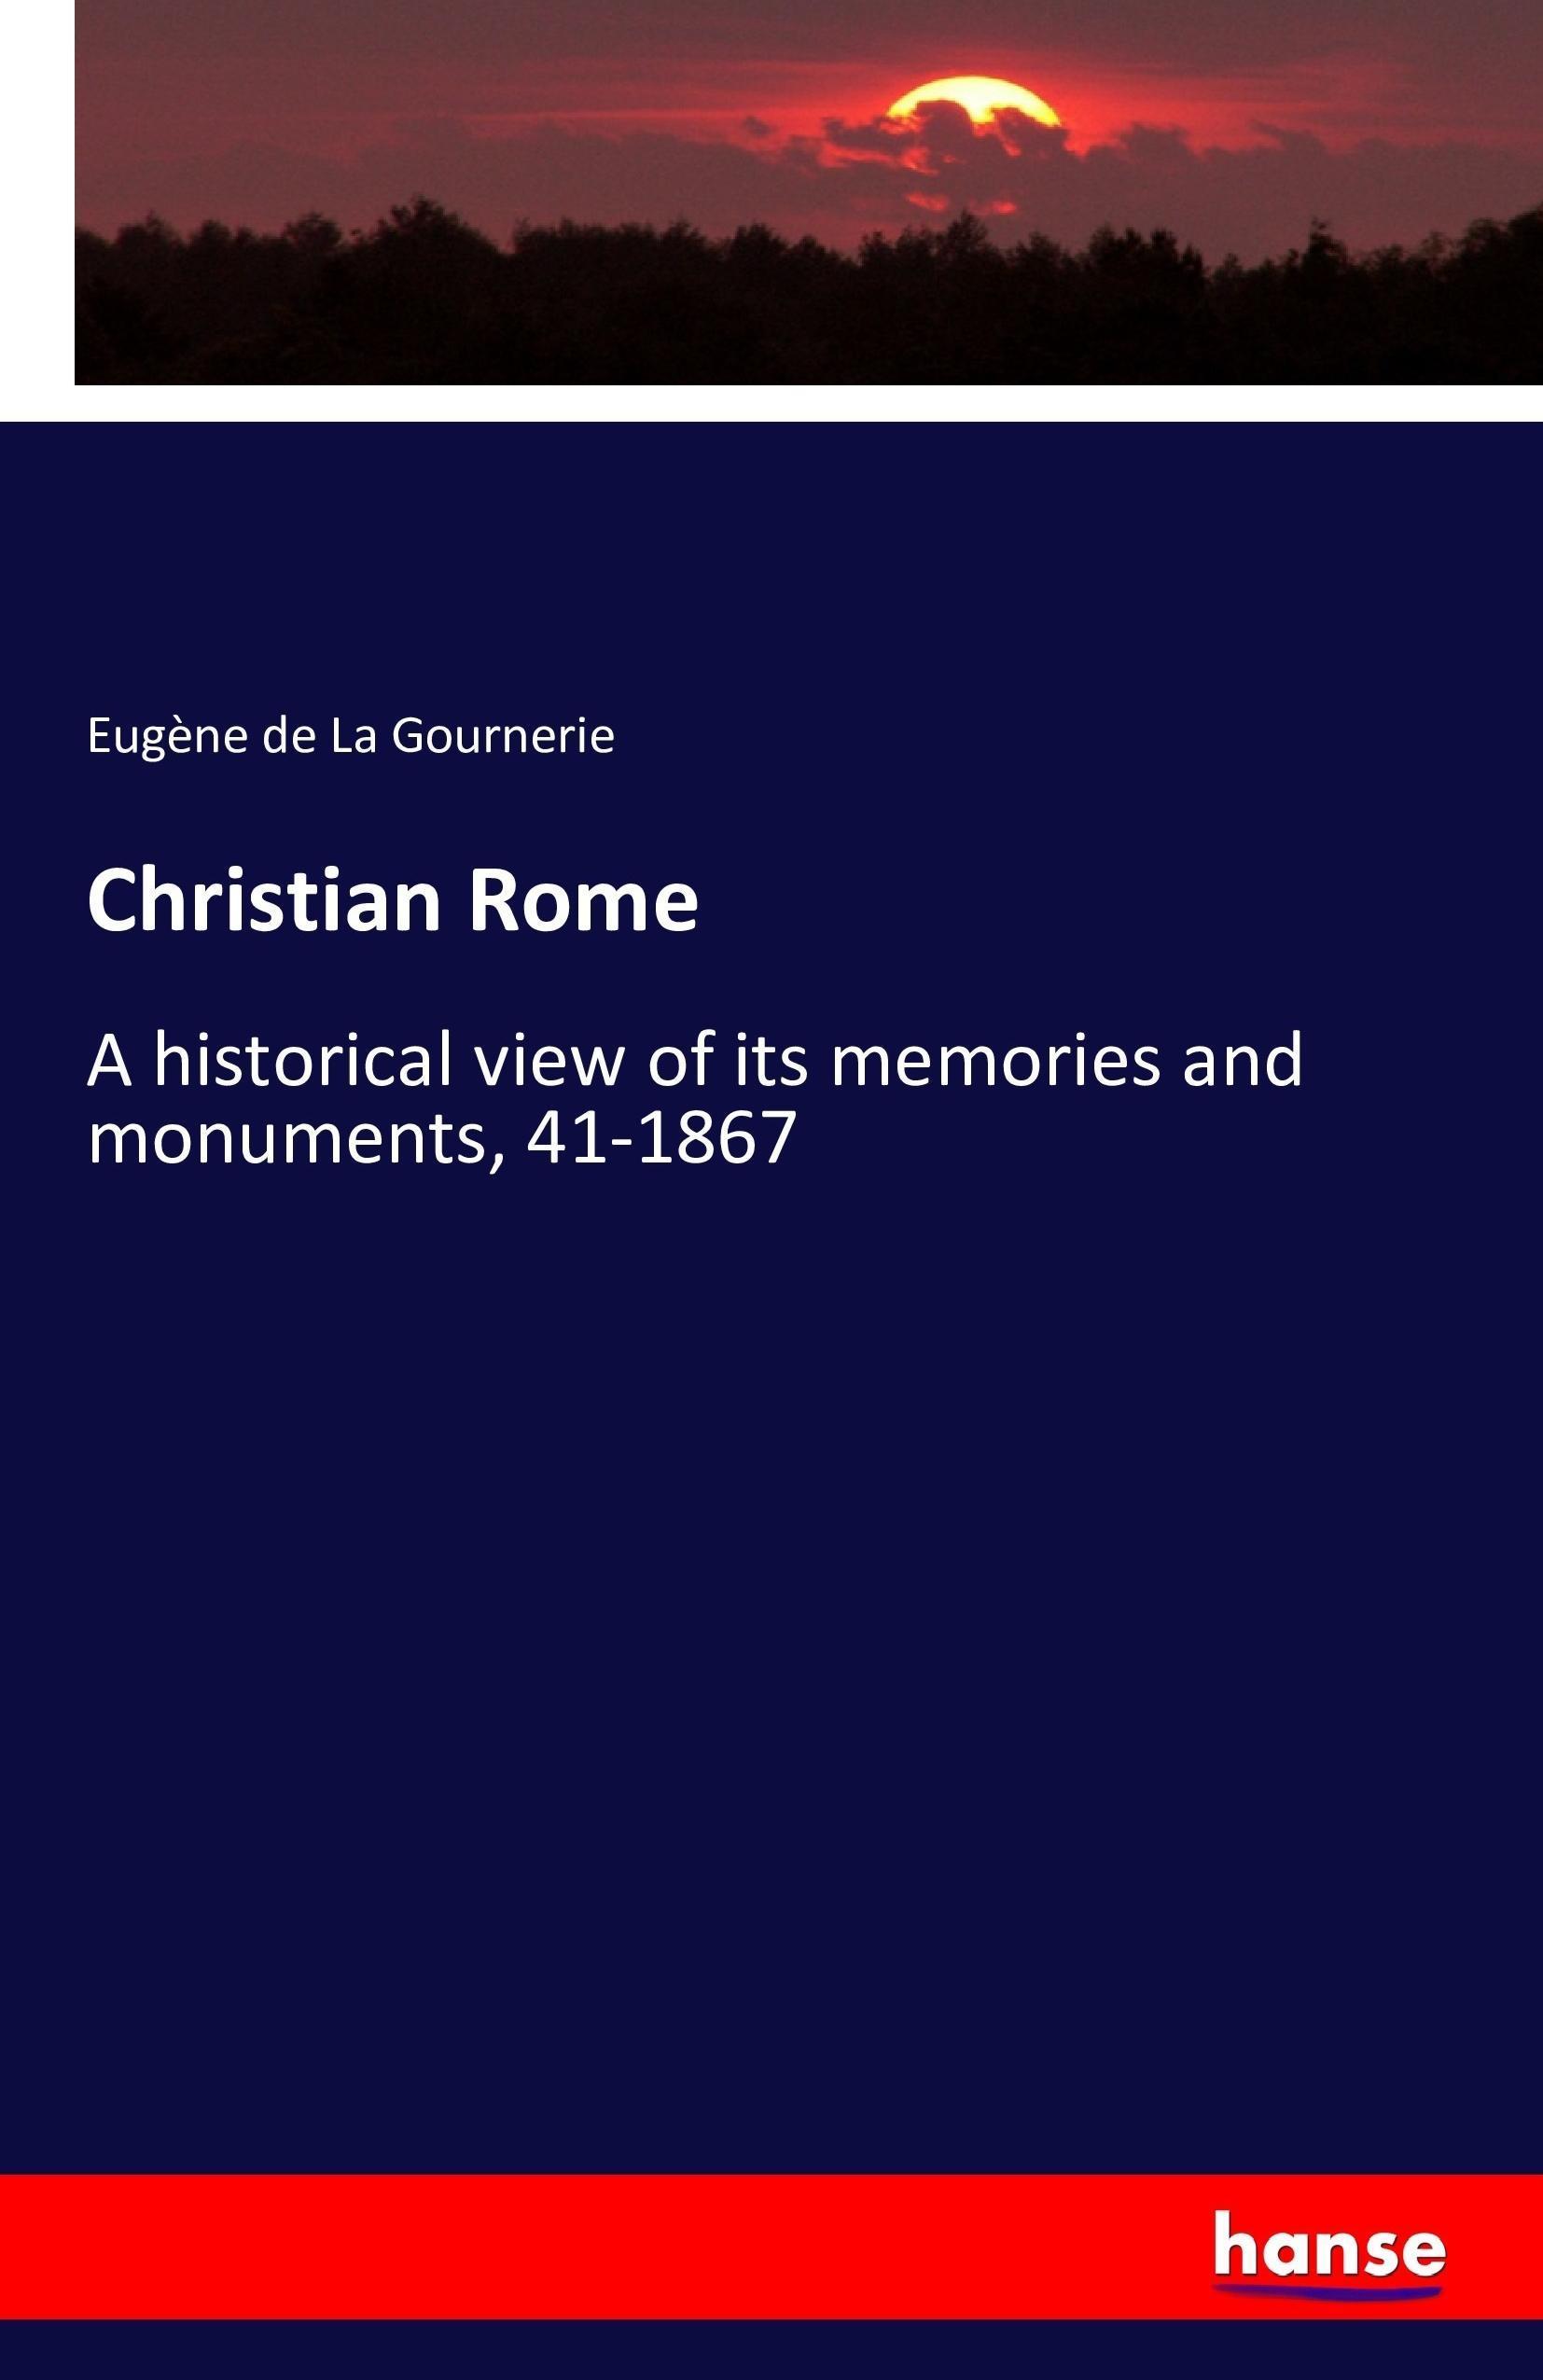 Eugène de La Gournerie / Christian Rome 9783742897442